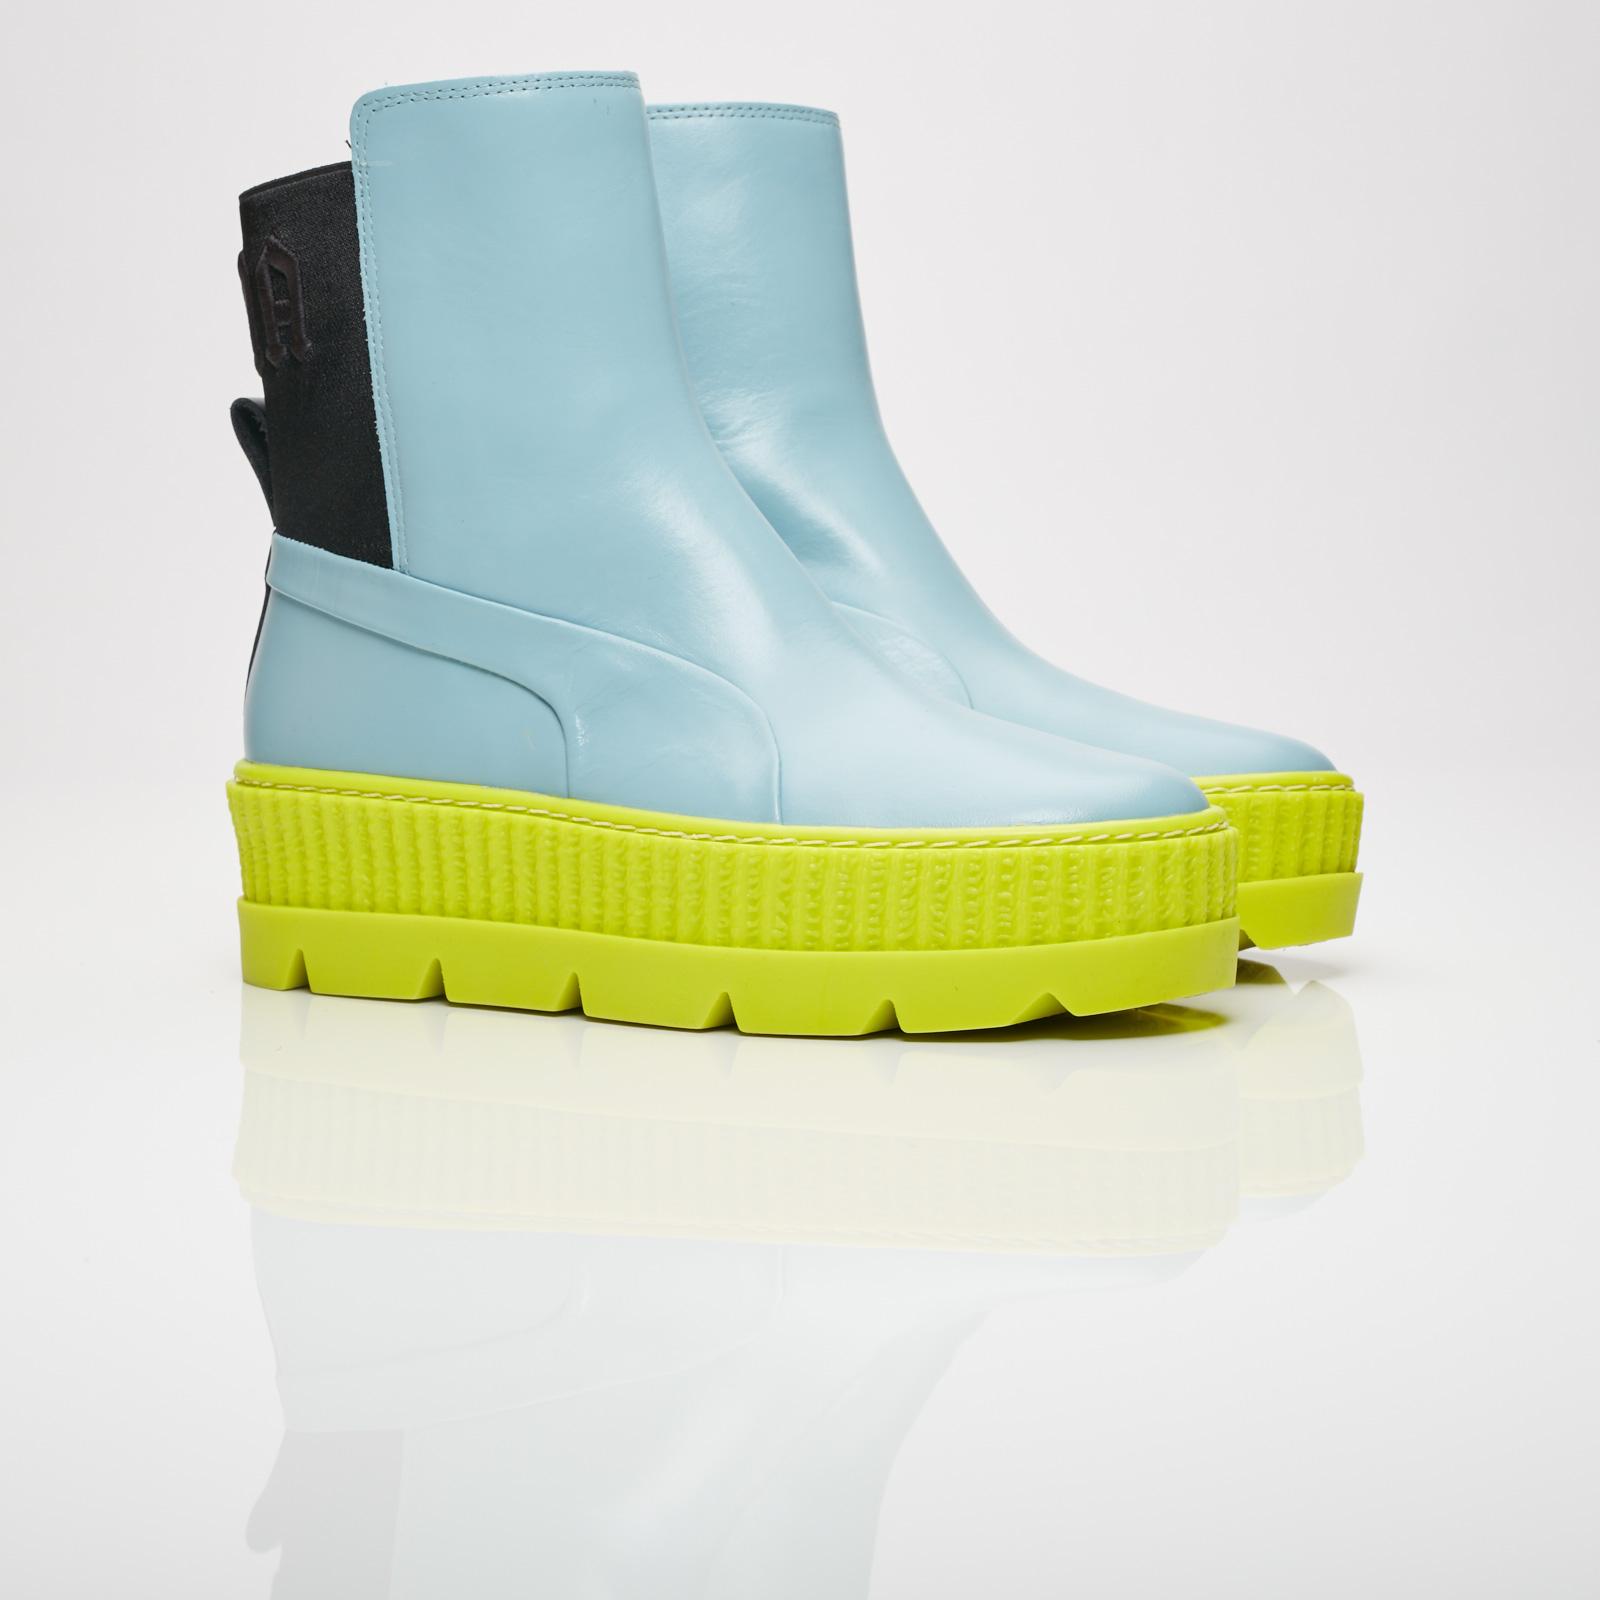 3f8ff1ab6548 Puma Chelsea Sneaker Boot Wns - 366266-01 - Sneakersnstuff ...